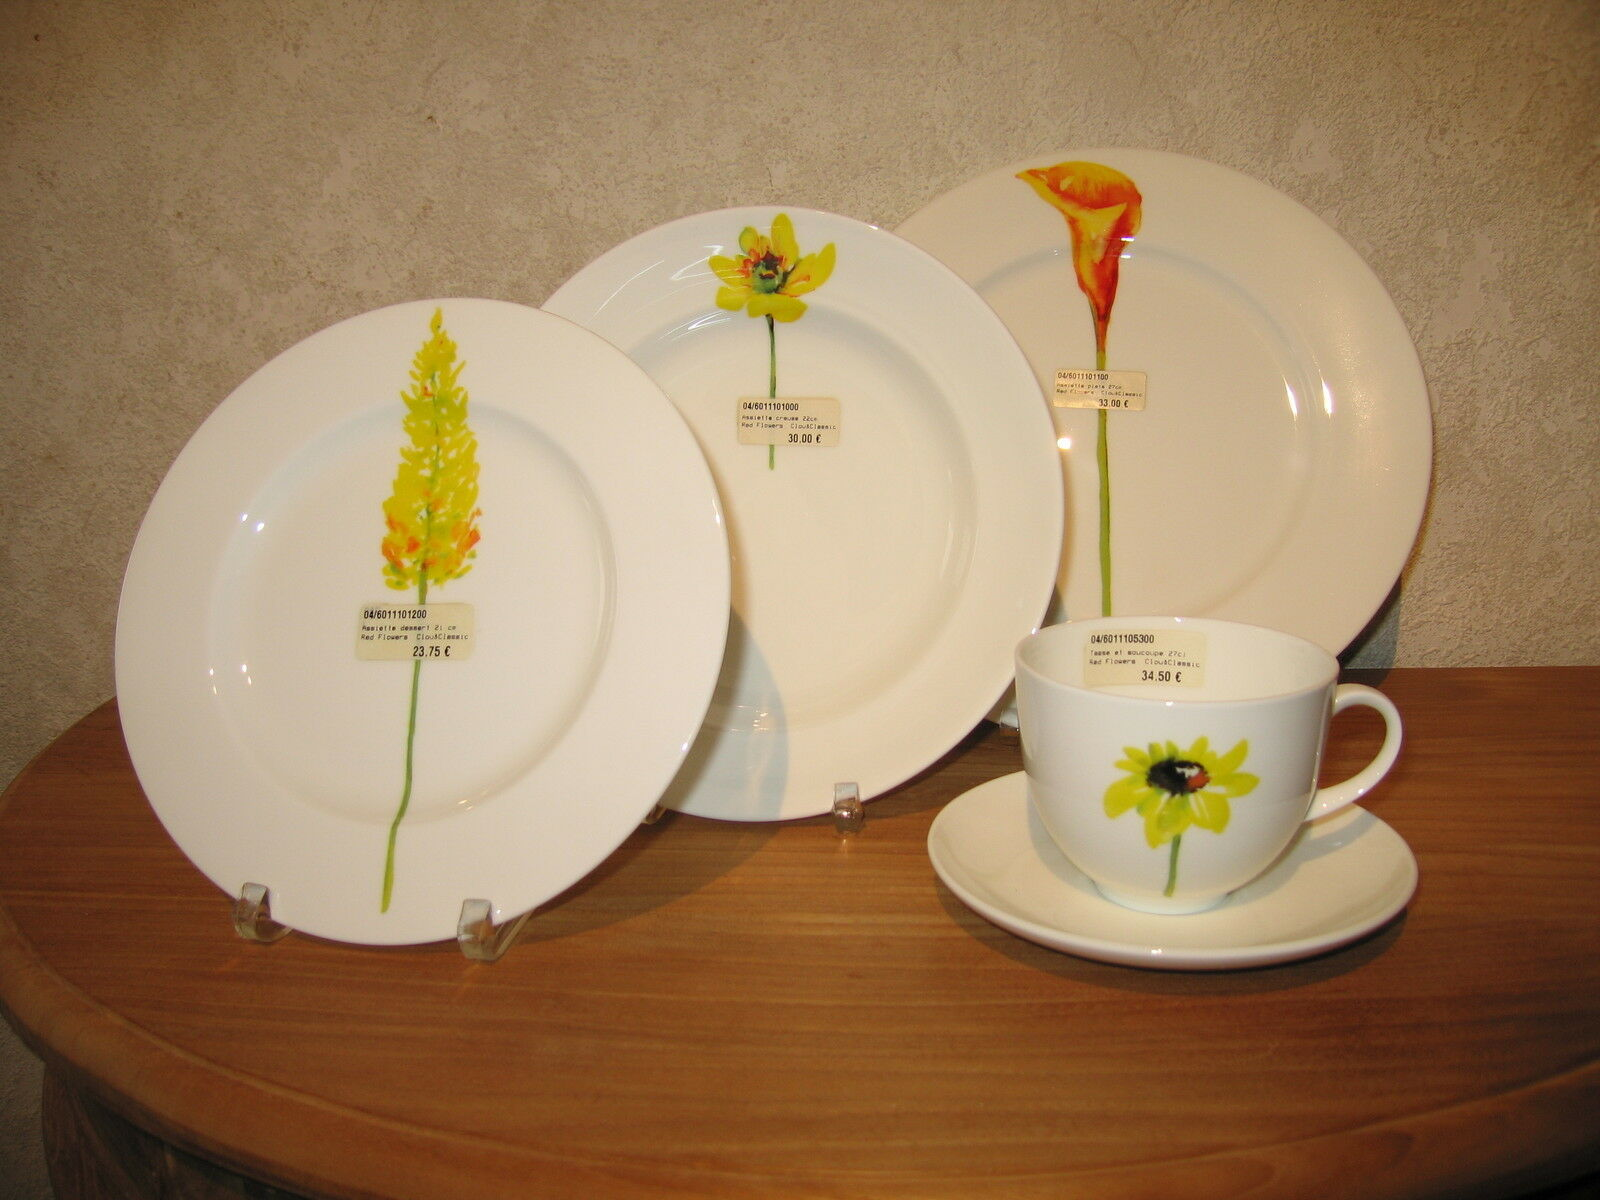 CLOU & CLASSIC NEW Gelb Flowers Set 3 Assiettes + 1 Tasse 60113